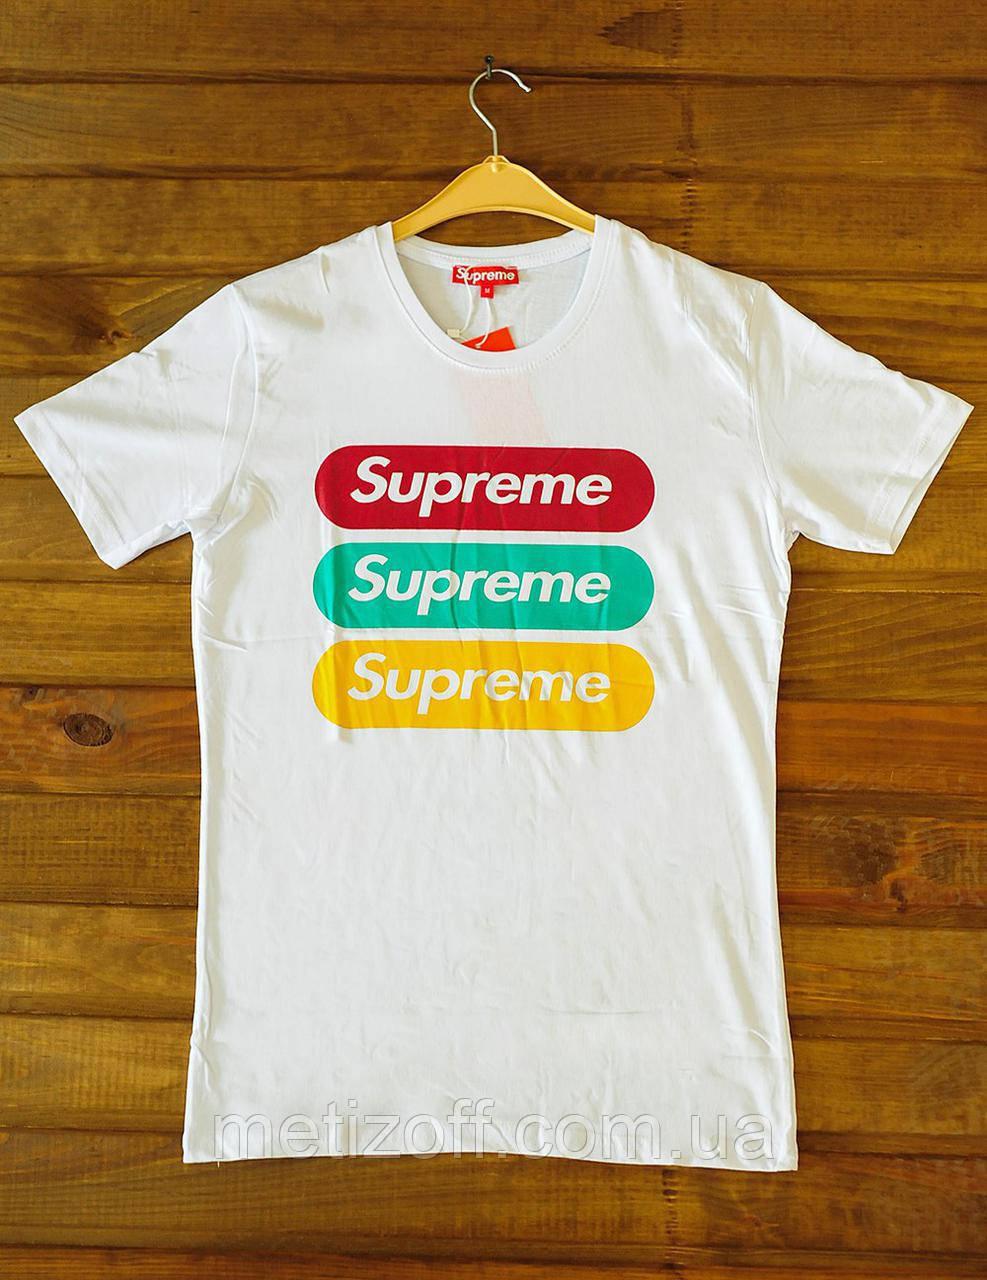 122a2e041be0 Мужская футболка Supreme - Интернет-магазин одежды, обуви и аксессуаров  MiroNis в Днепре